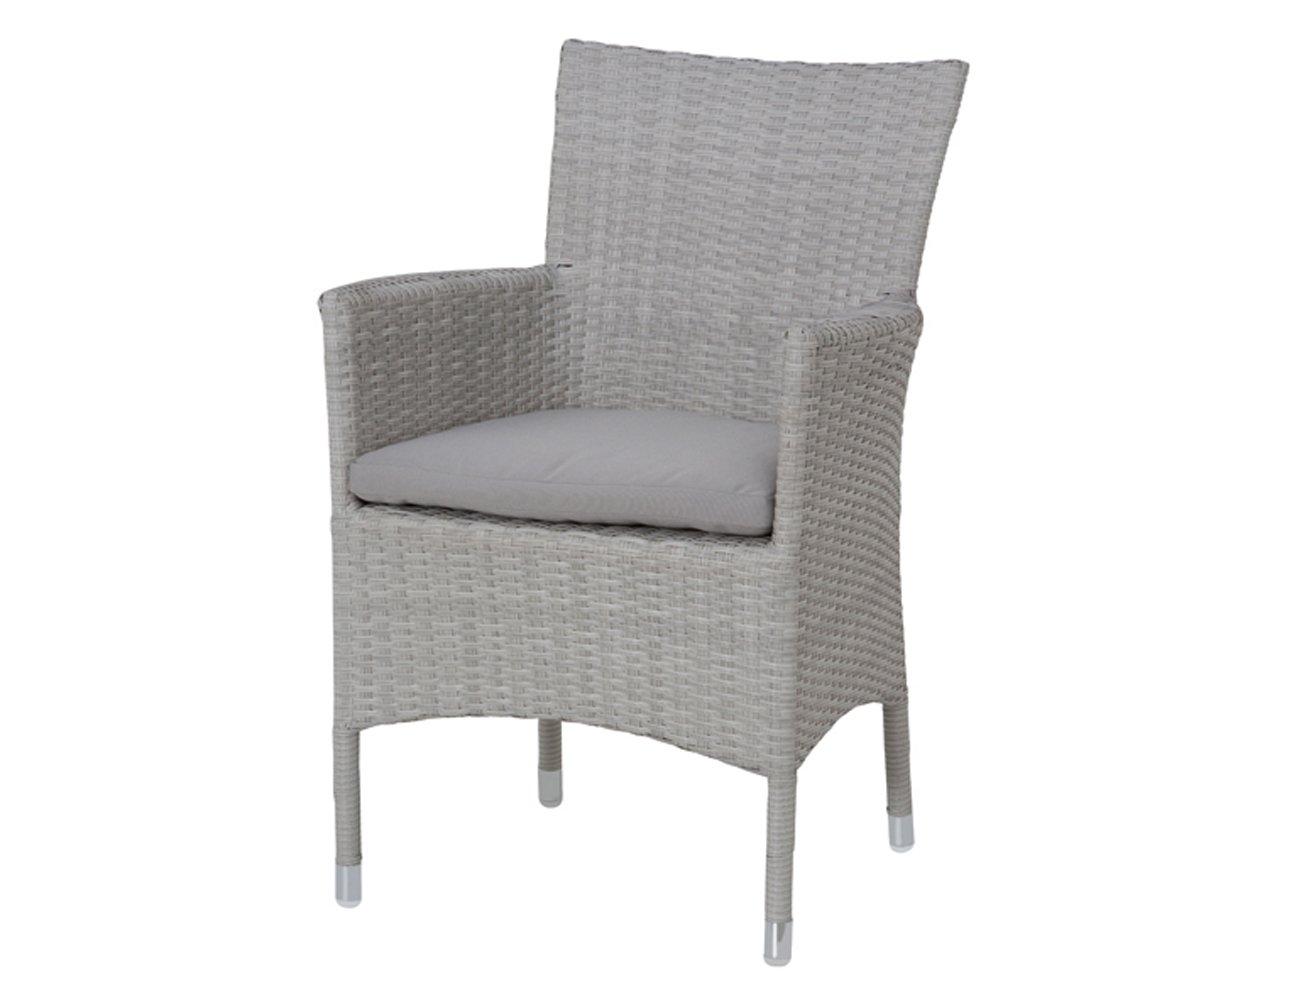 siena garden 912834 sessel bern aluminium untergestell gardino geflecht polar kissen grau 61. Black Bedroom Furniture Sets. Home Design Ideas